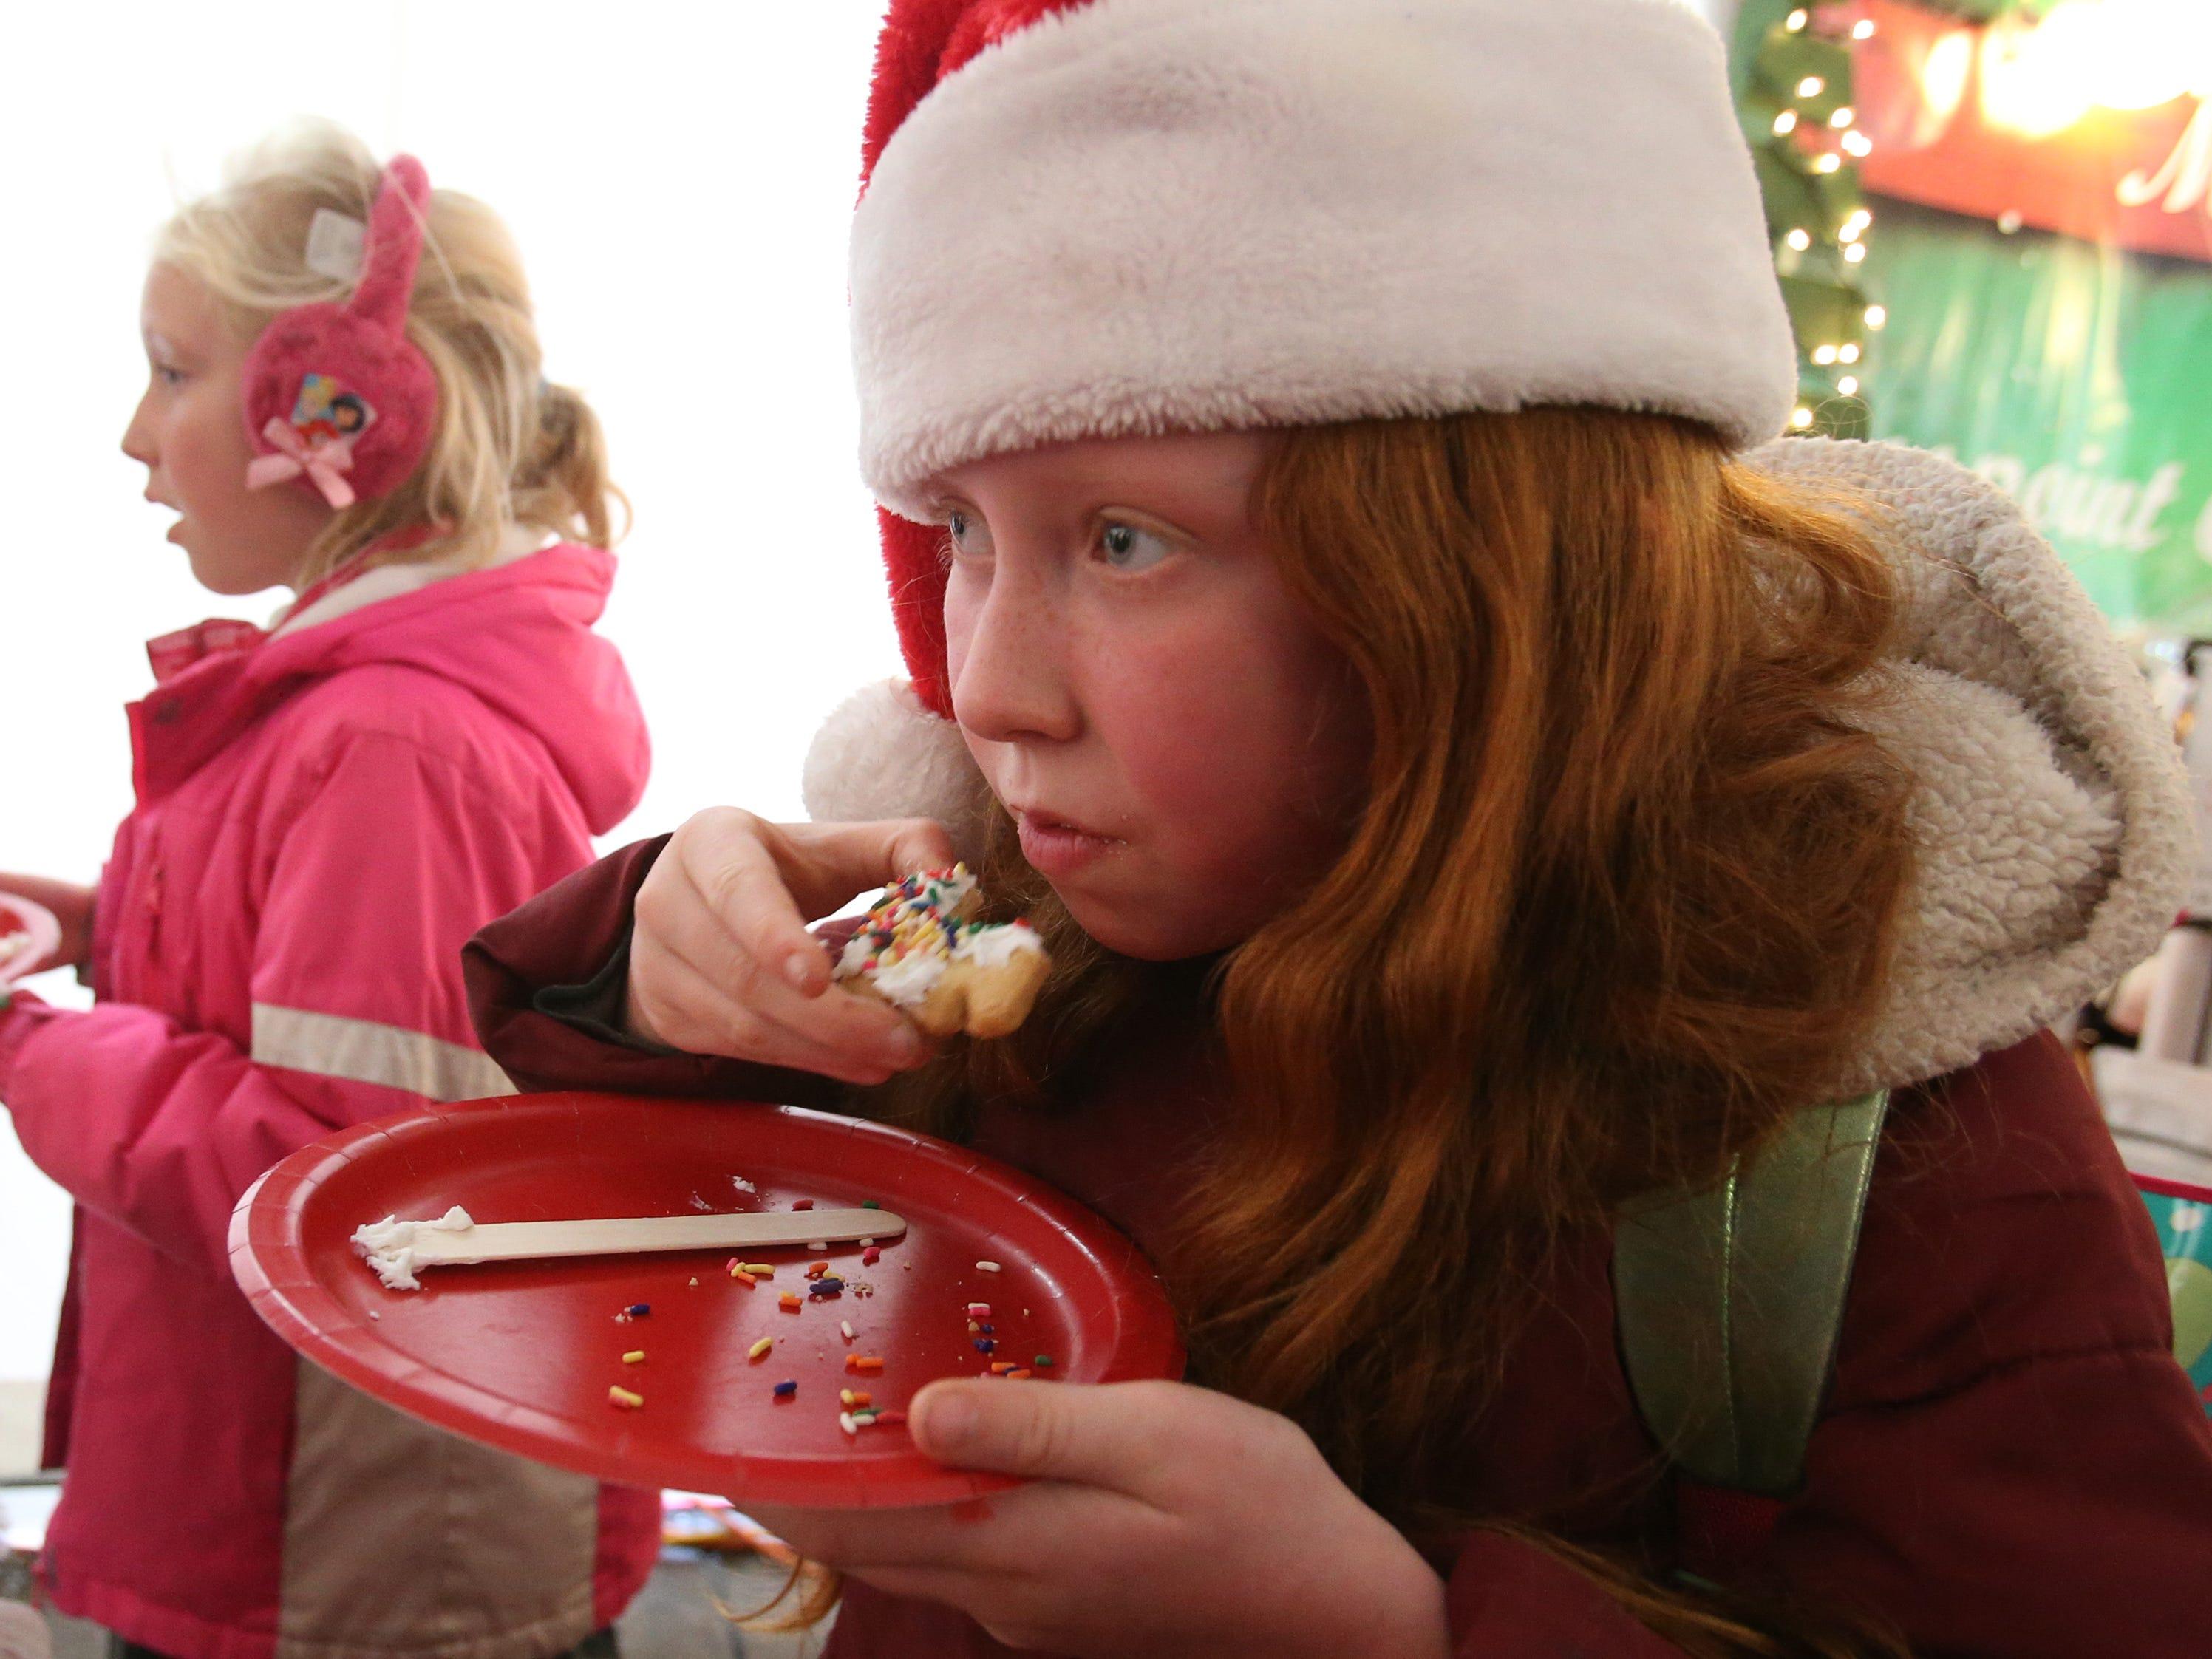 Kalleigh Kuzenski snacks on a cookie she just created at the German Christmas Market of Oconomowoc on Nov. 23.